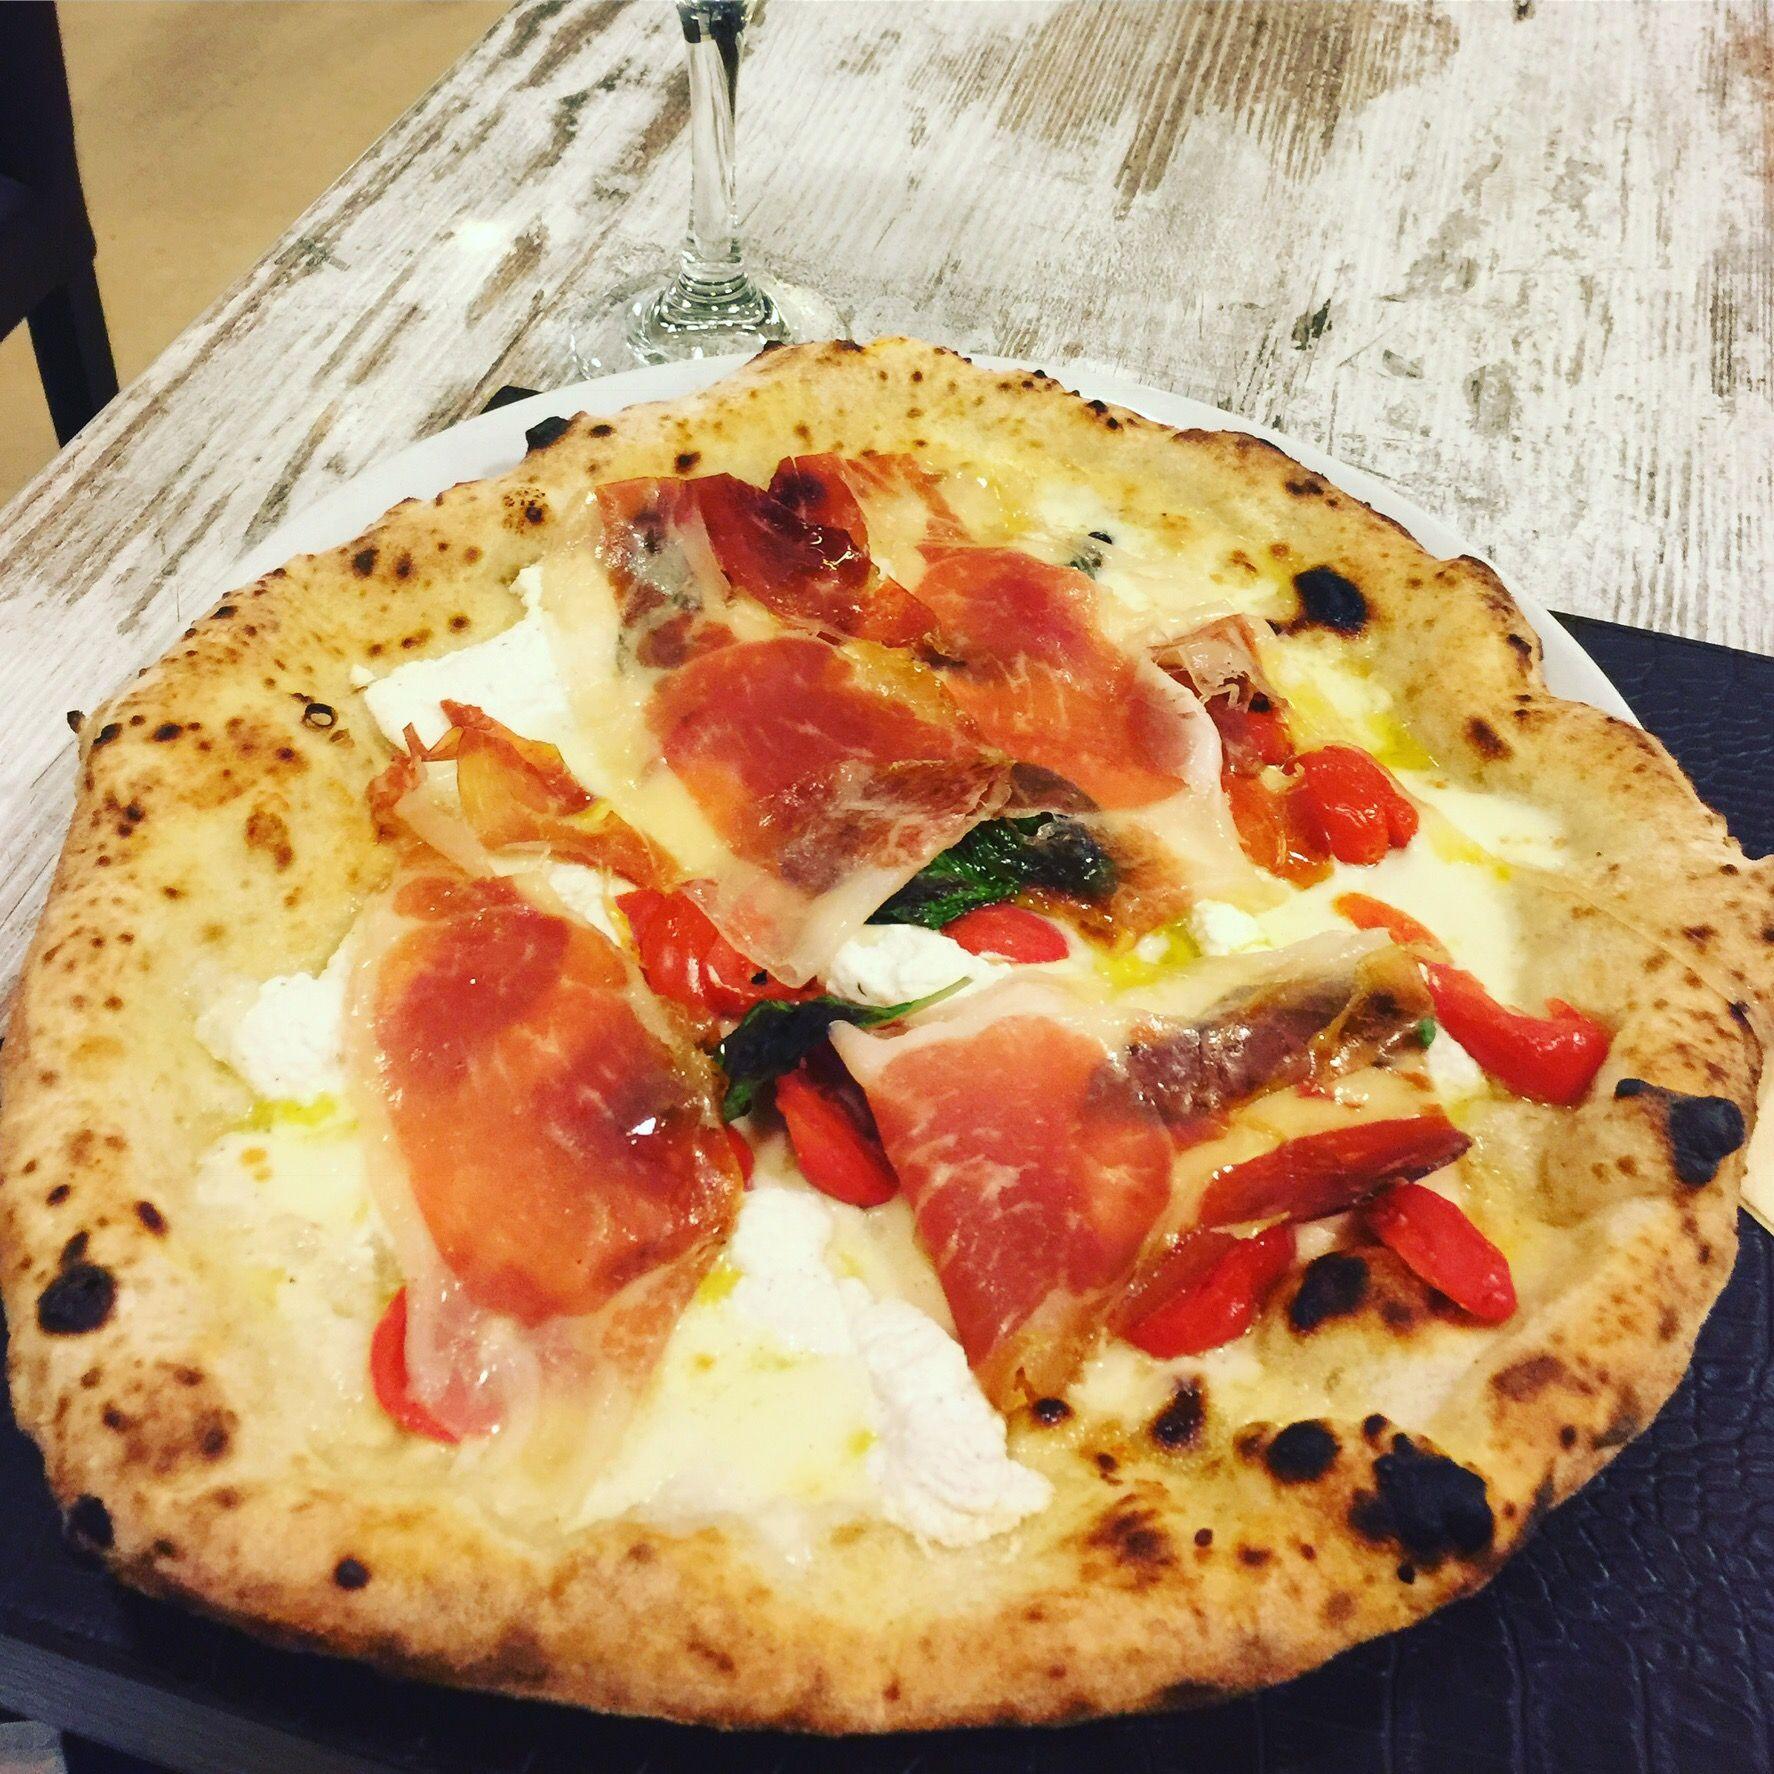 Delicious Mozzarella pomodorino pachino, ricotta, crudo di Parma Pizza--Pizzería Caputo Milan Italy